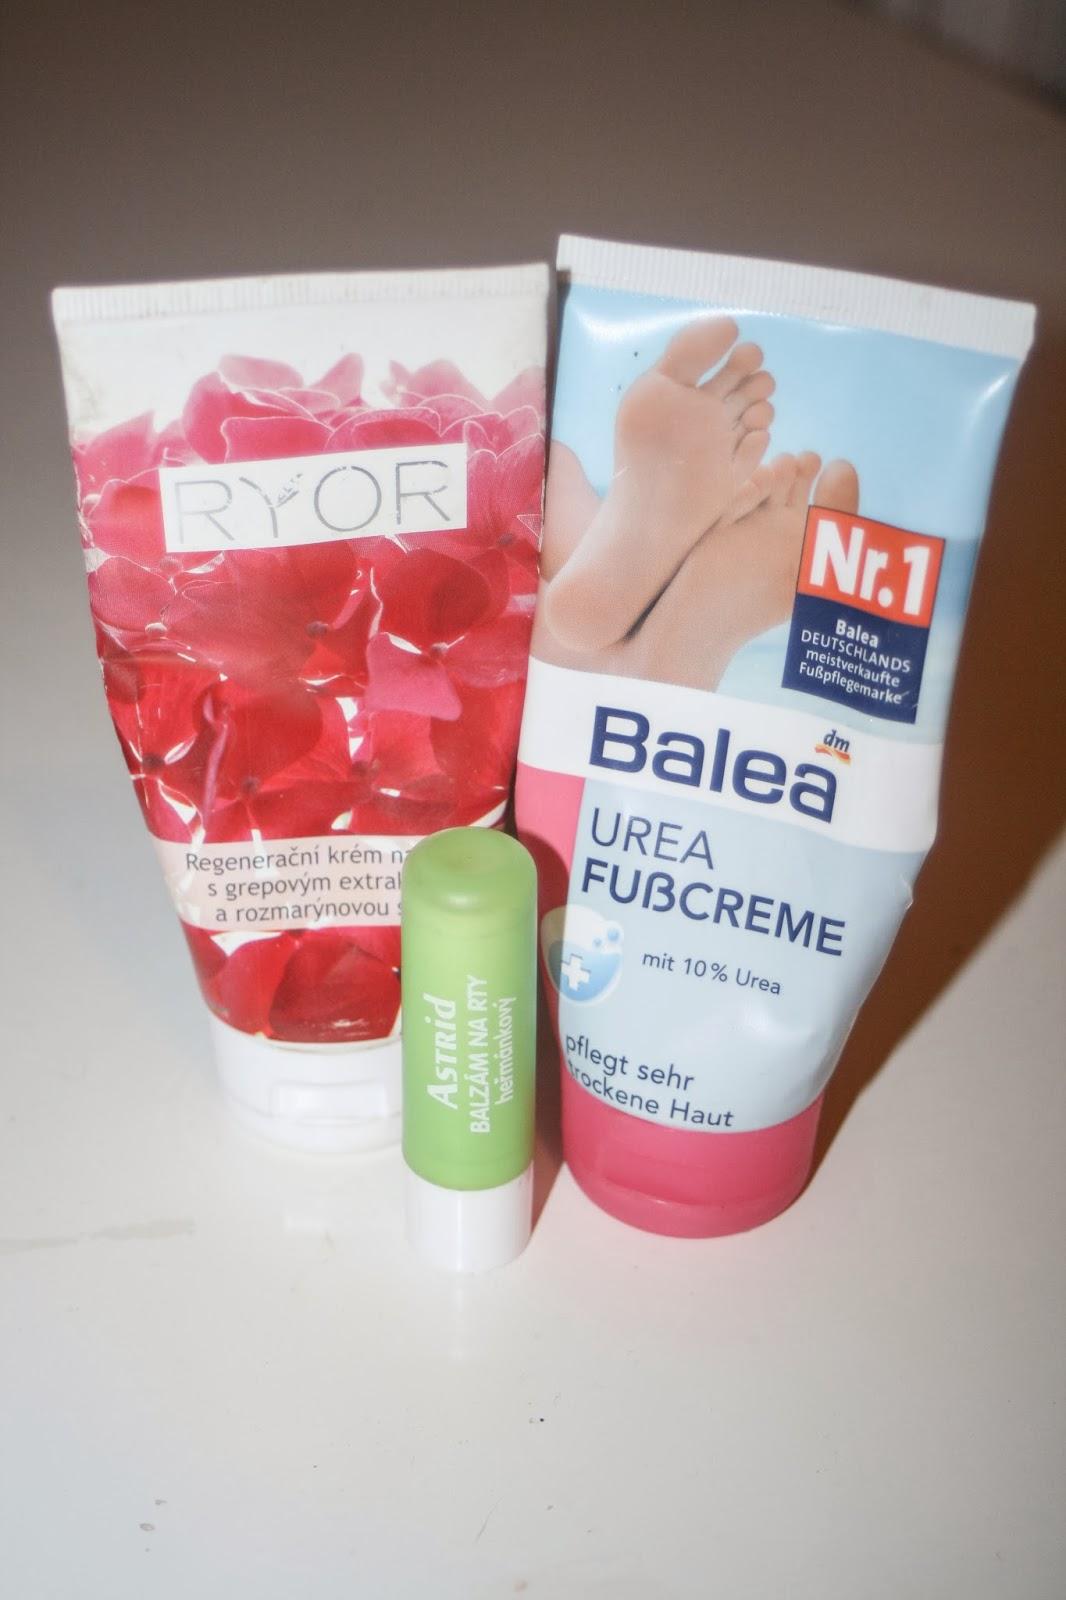 balea, ryor, hands, foot, astrid